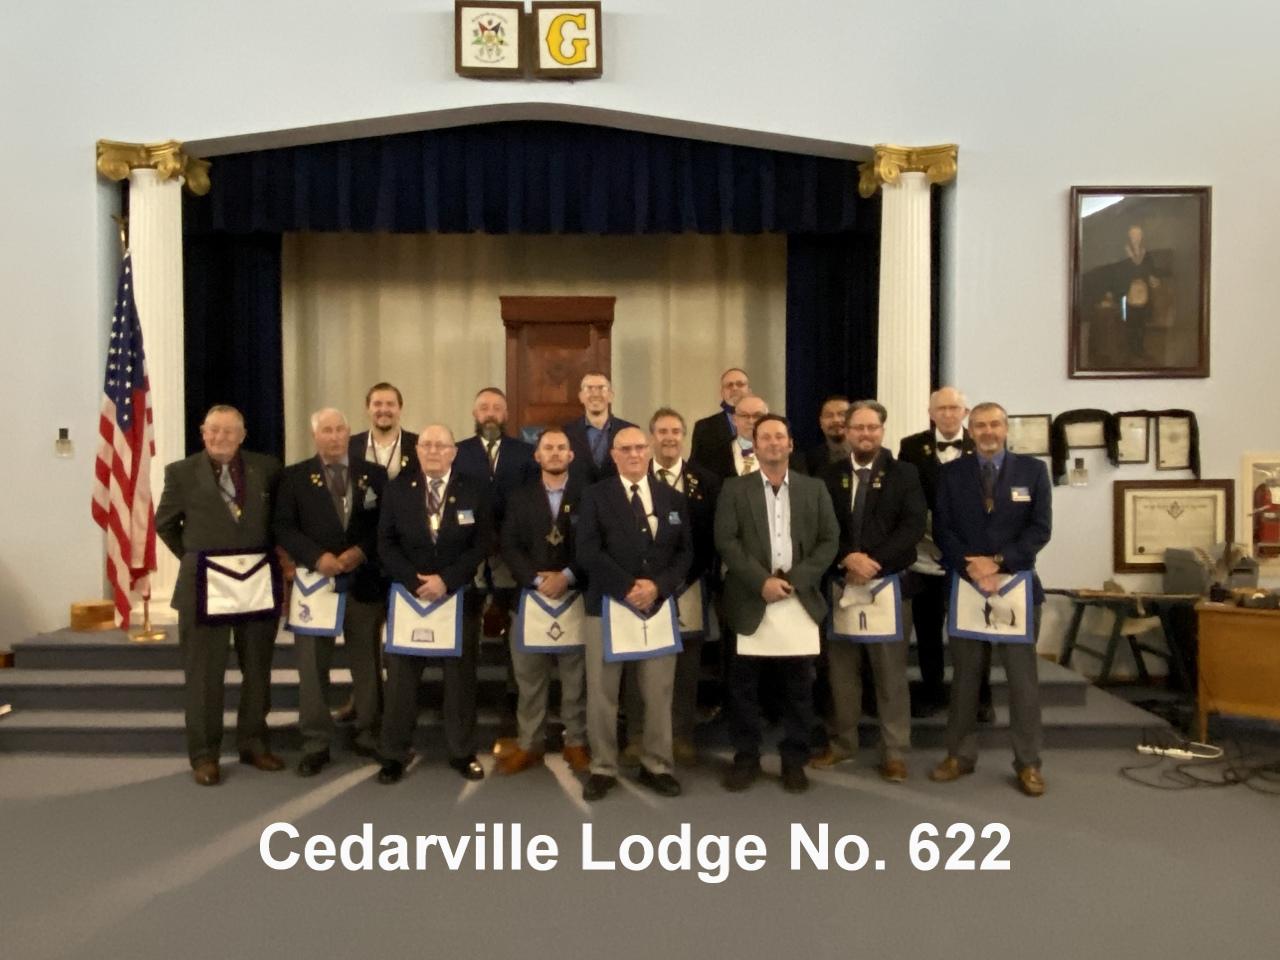 Cedarville-Lodge-No.-622a